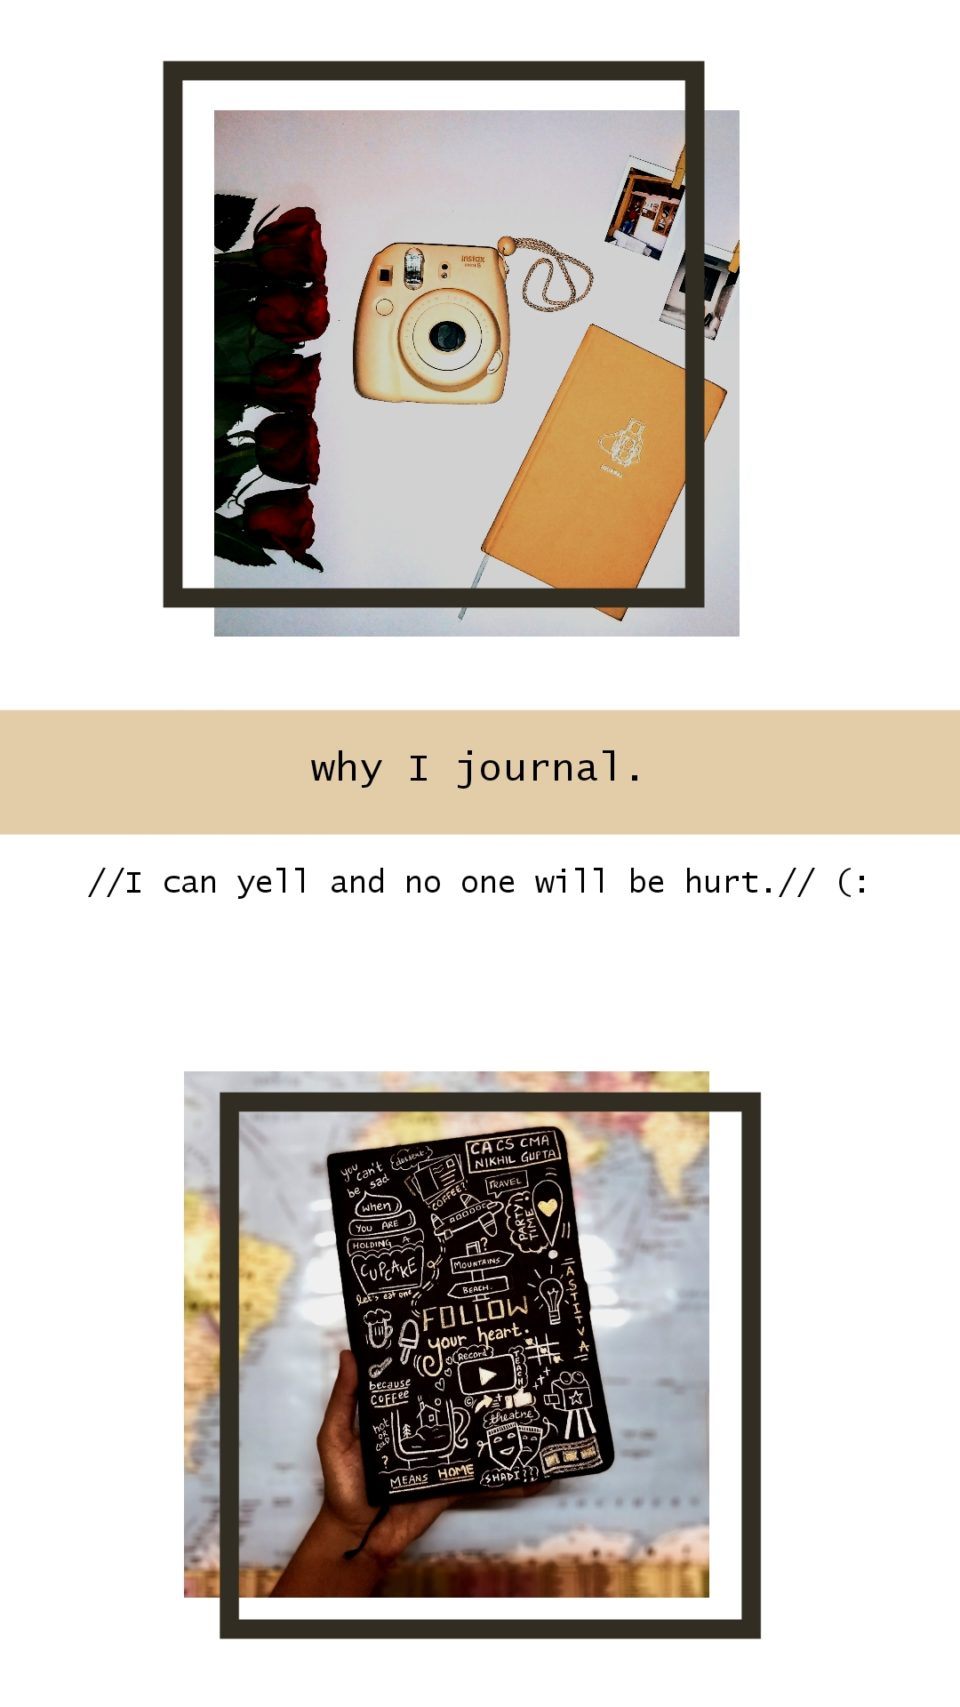 why i journal.